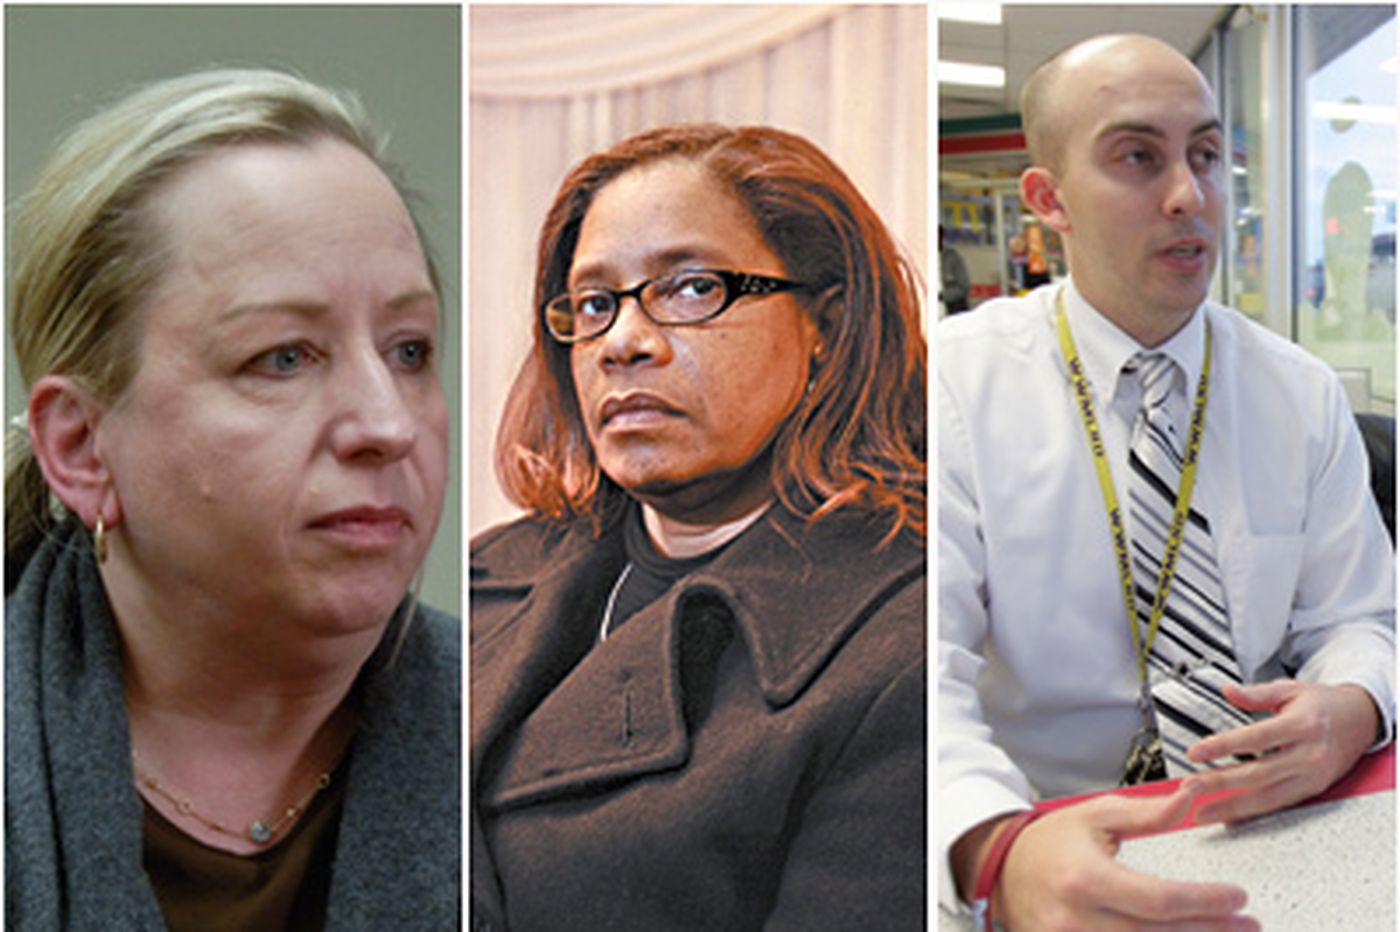 Violence Targets Teachers, Staff